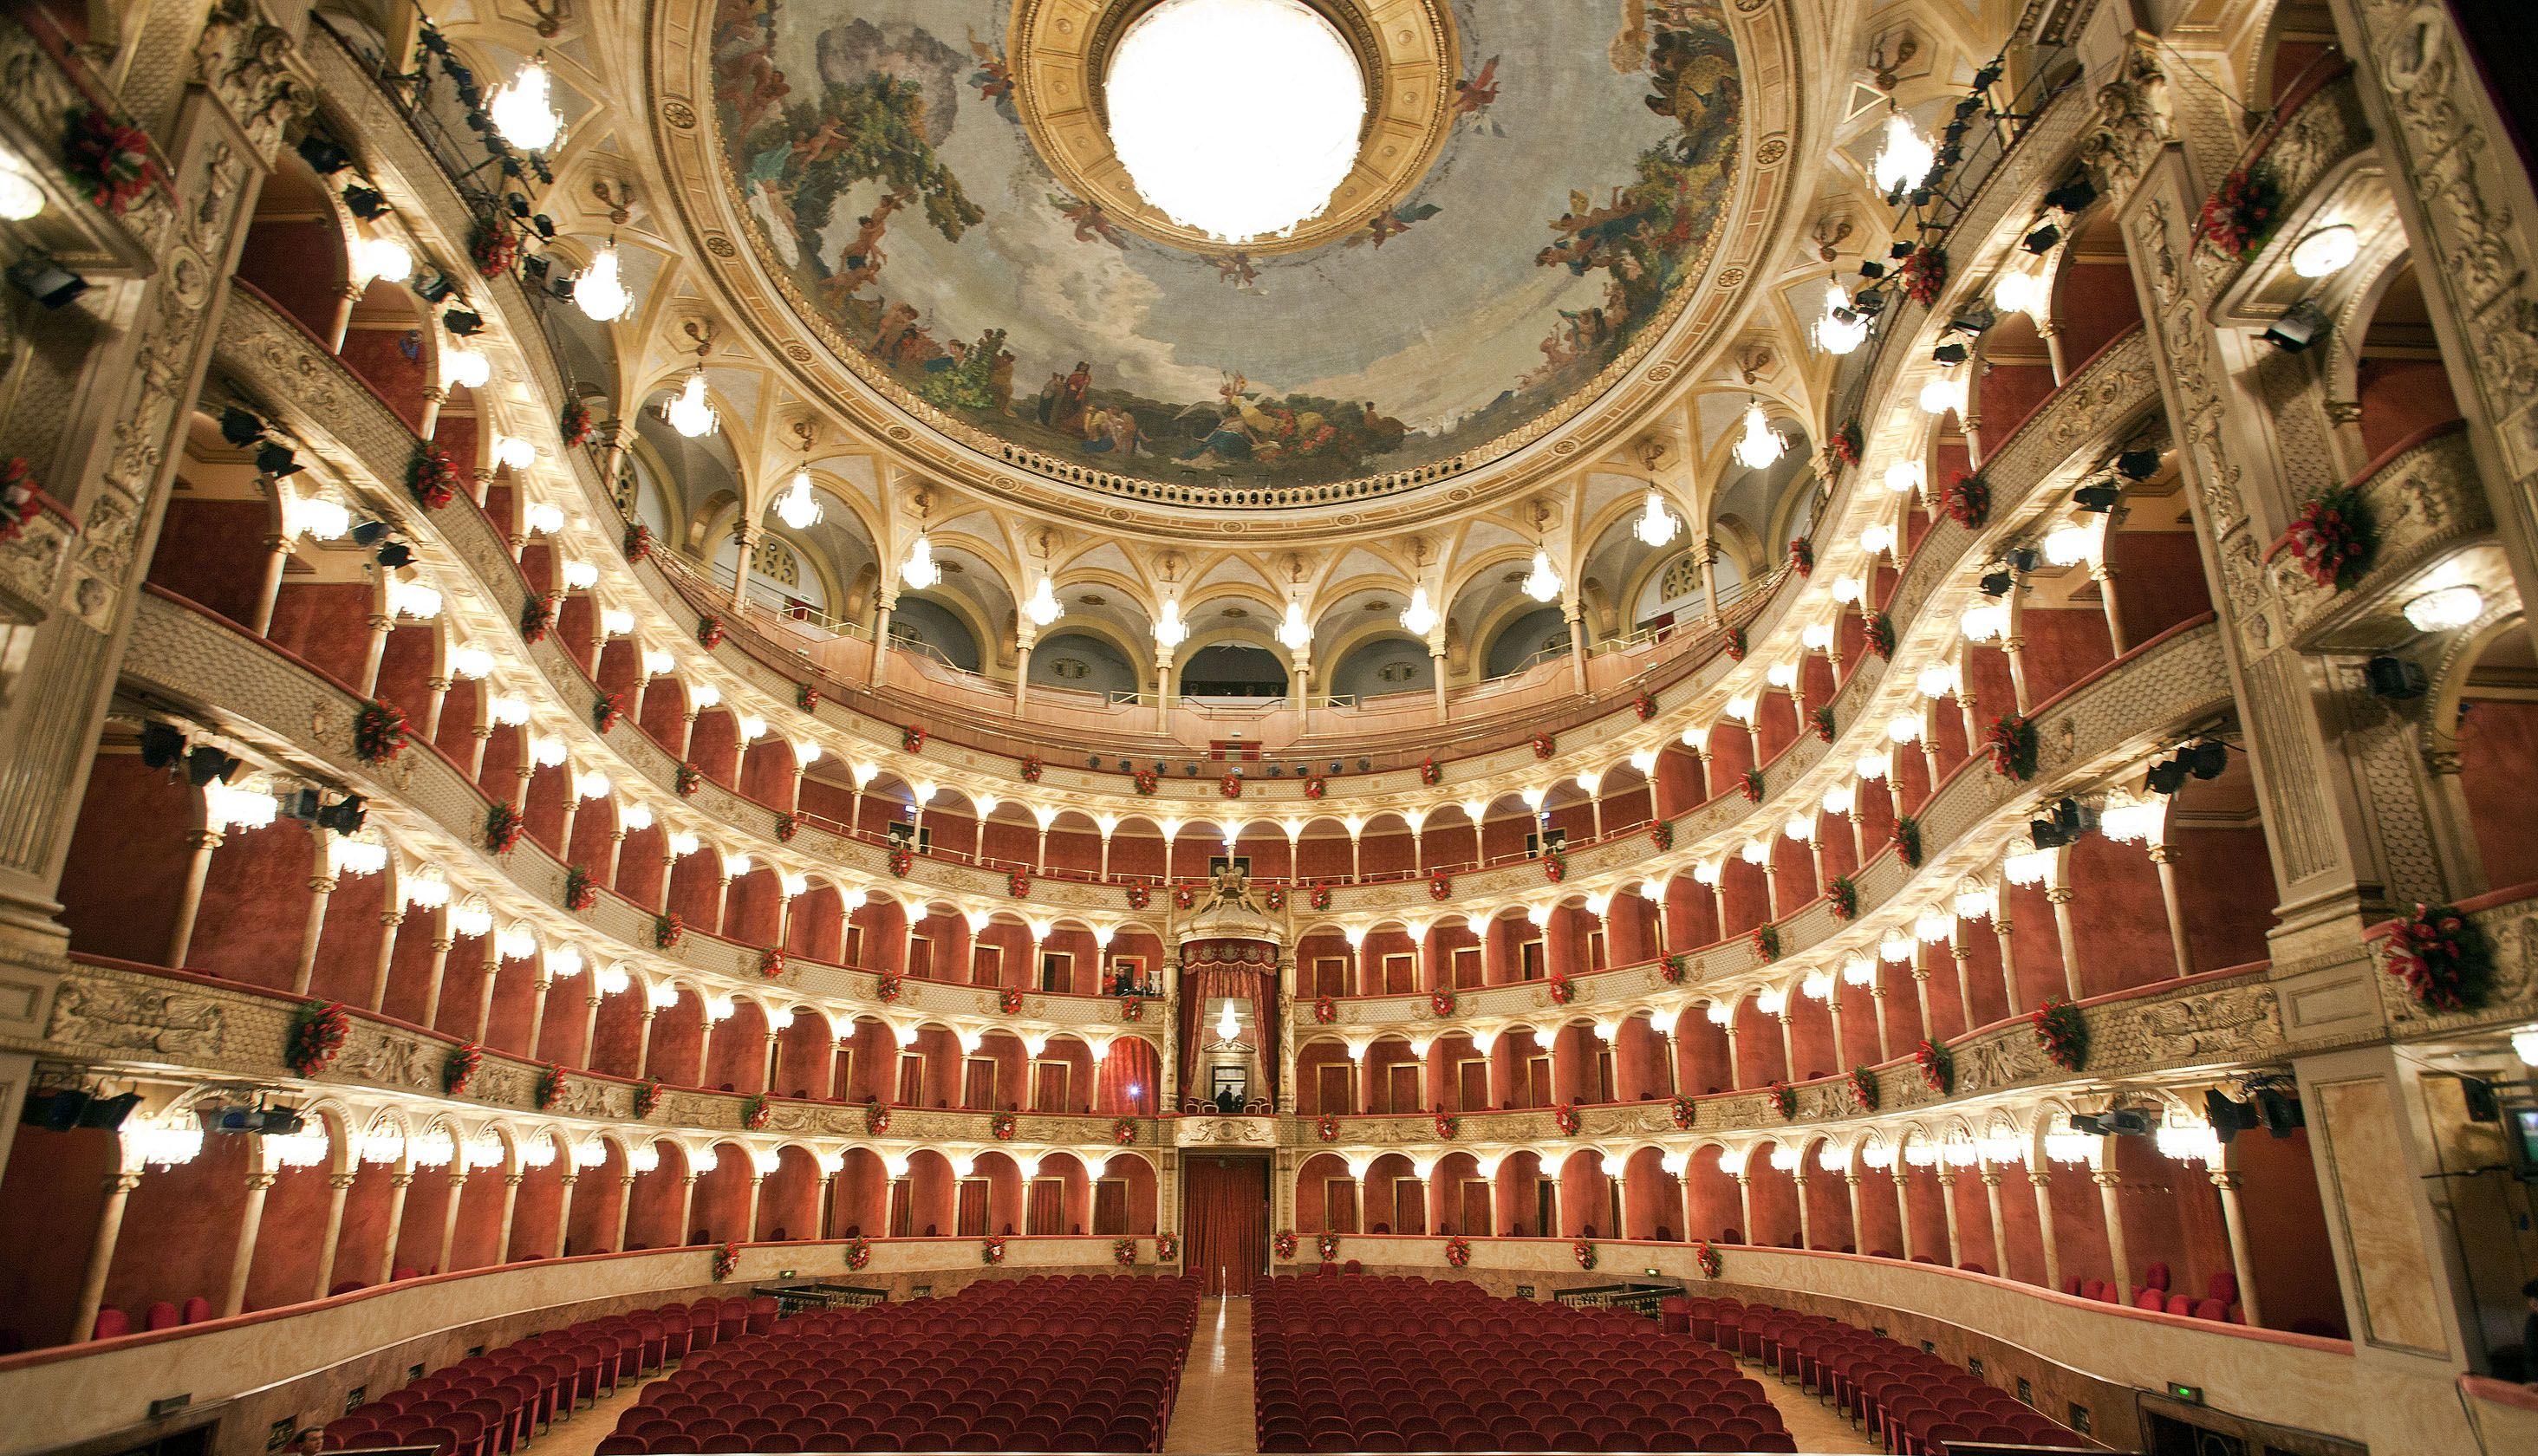 teatro dell 39 opera di roma teatros pinterest teatro